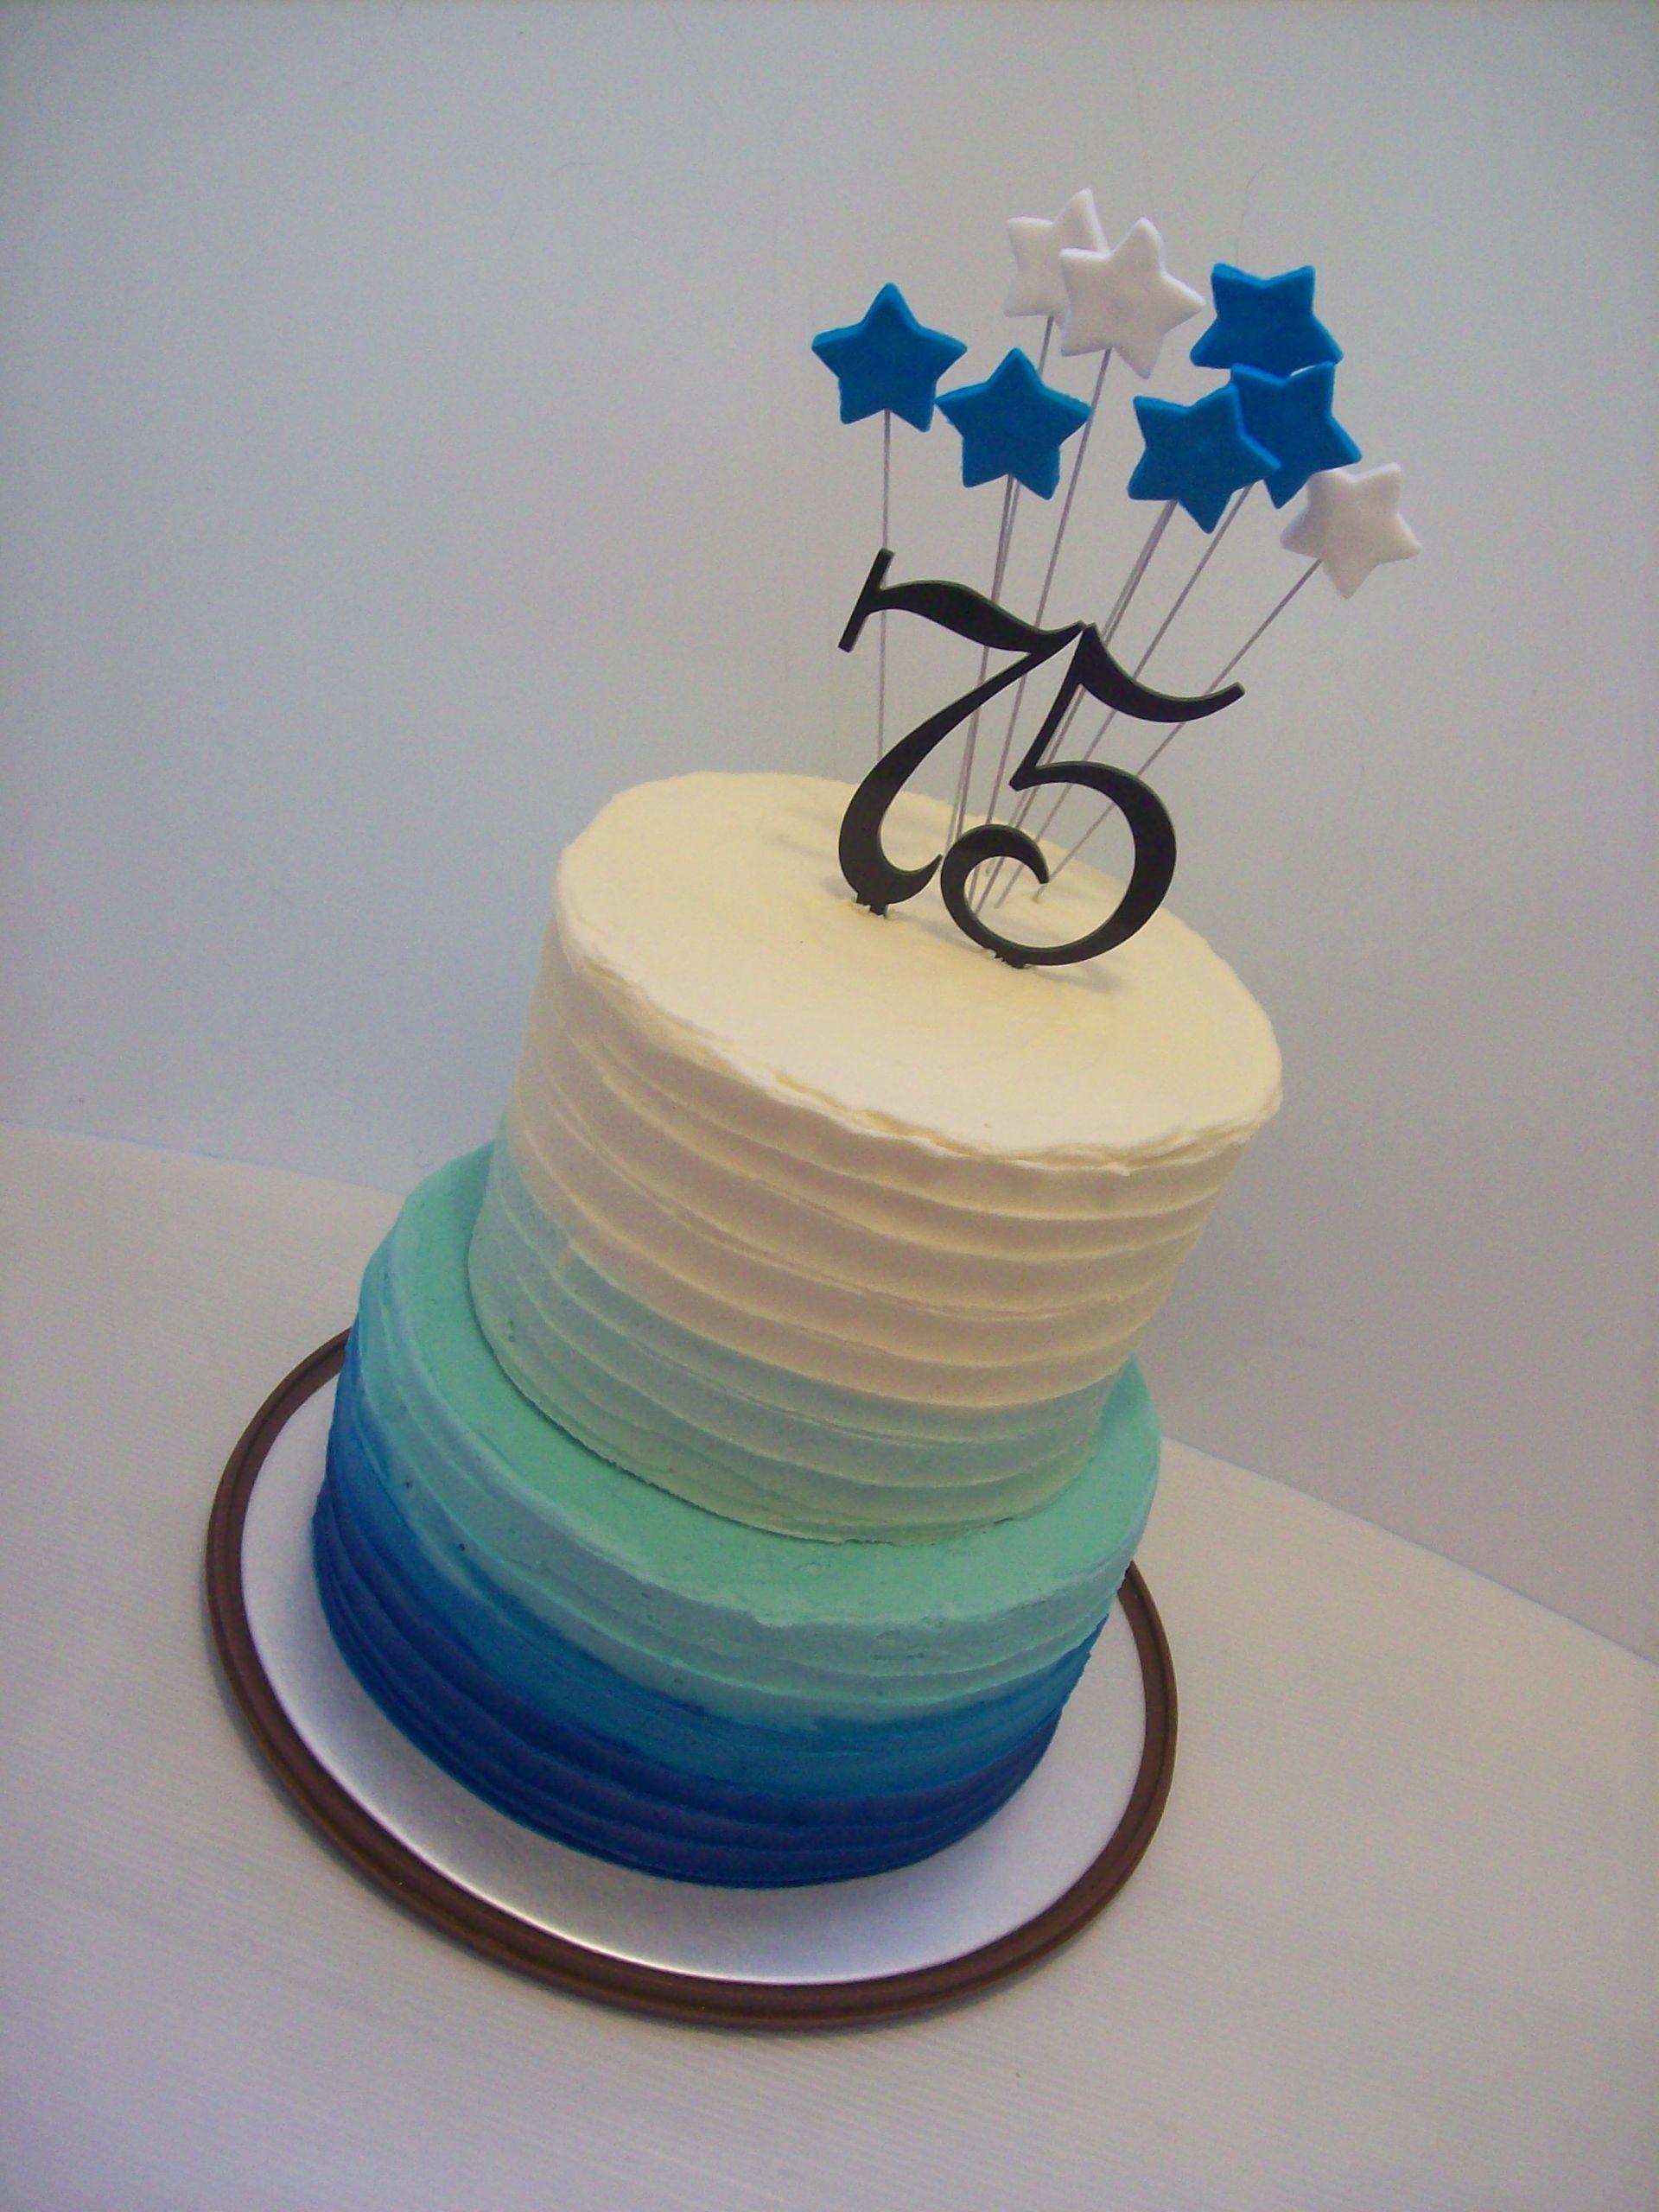 75th Birthday Cakes  75th Birthday Cake $250 • Temptation Cakes